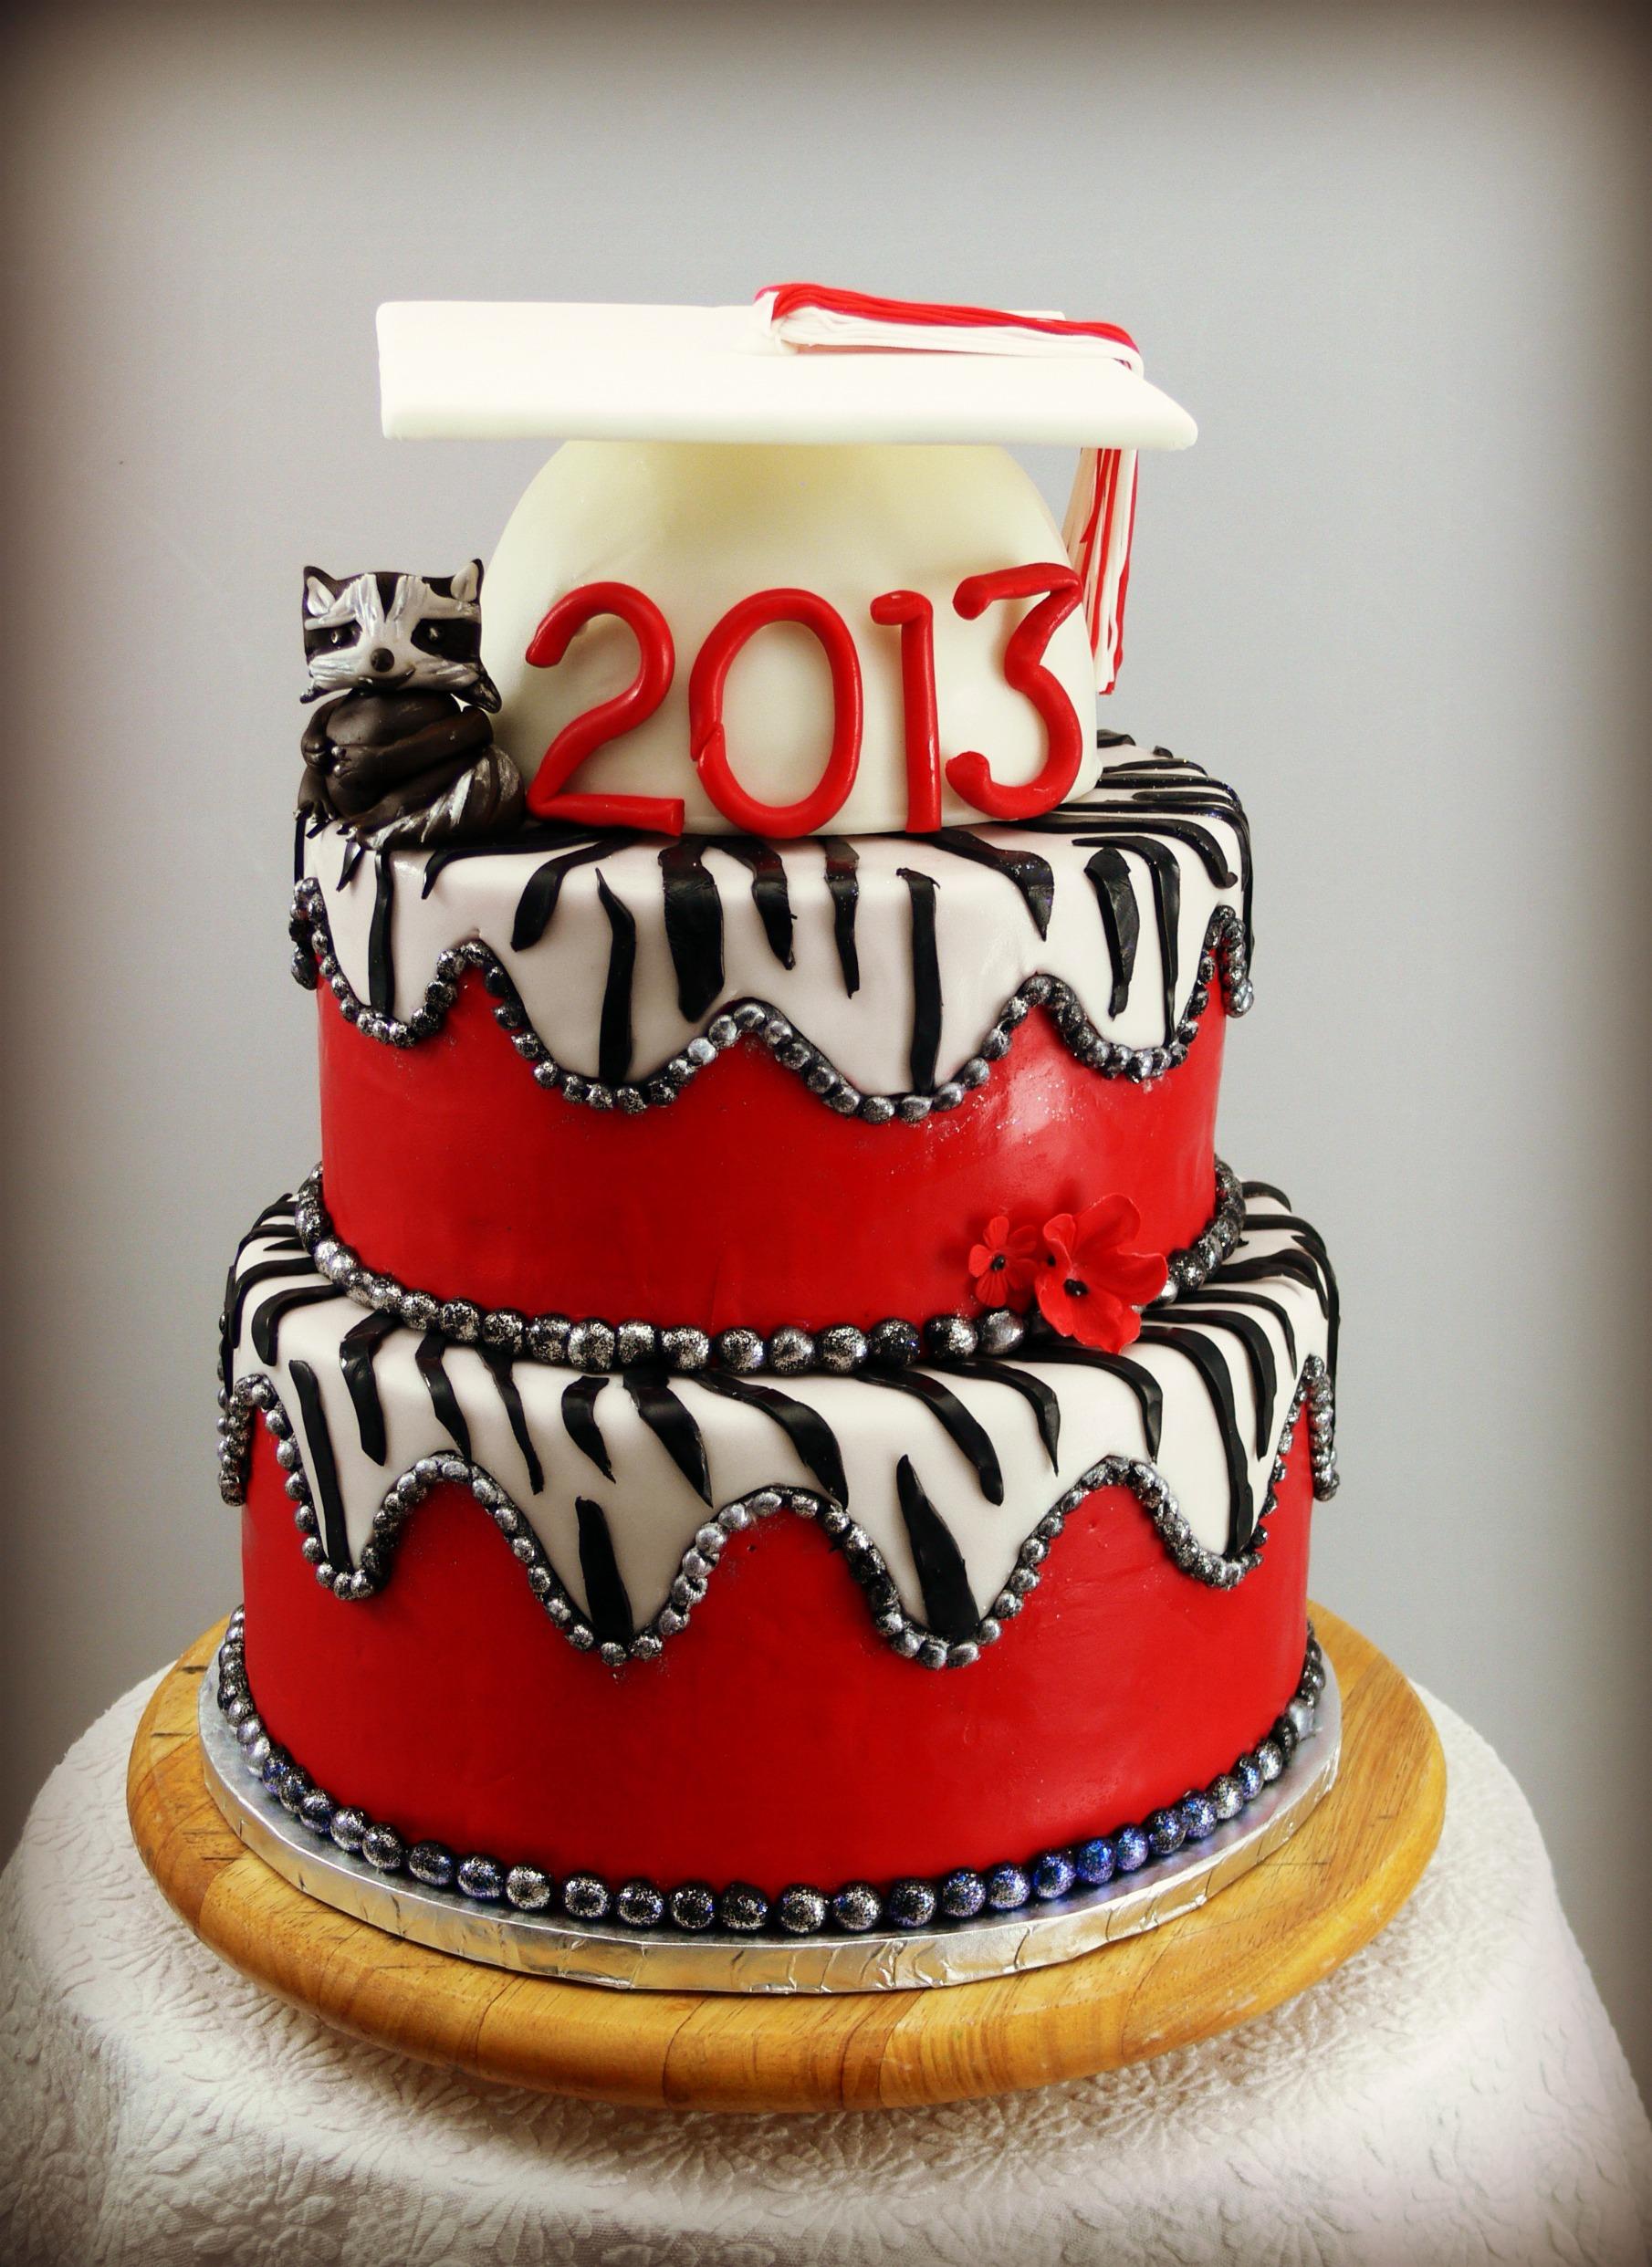 Red Velvet Graduation cake with zebra and raccoon.jpg